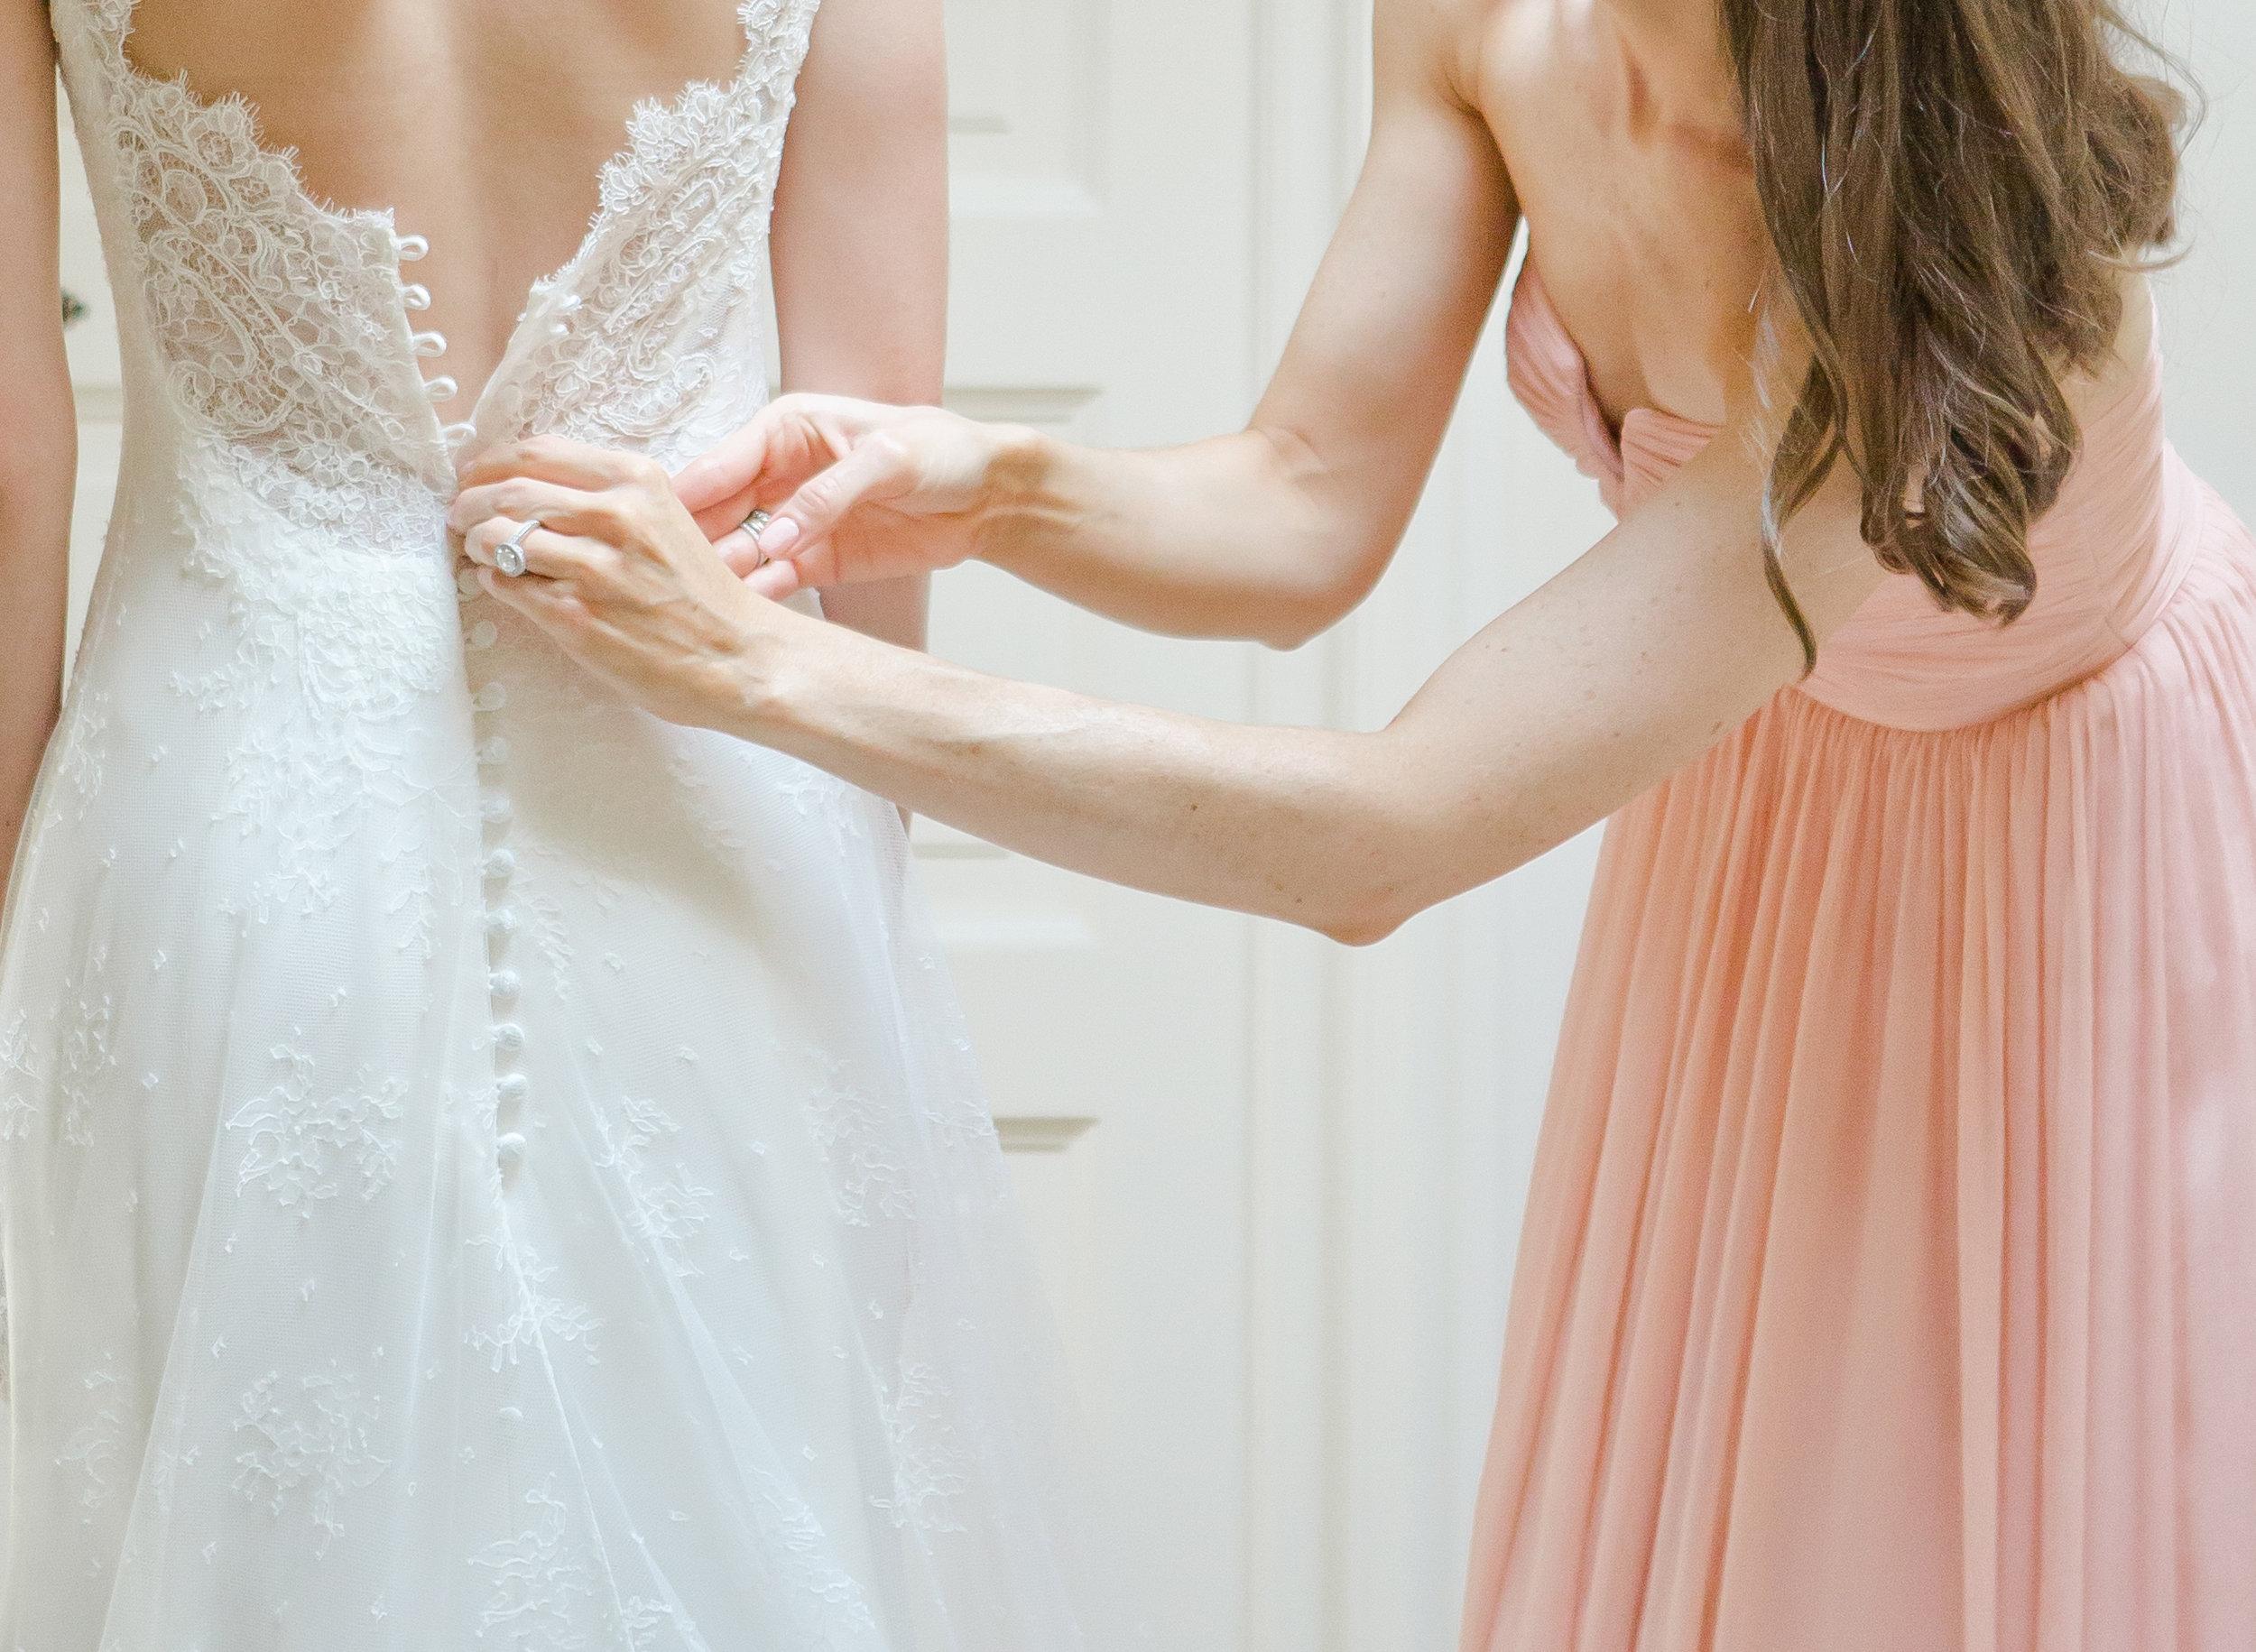 provence-wedding-rory-wylie.jpg-38.jpg